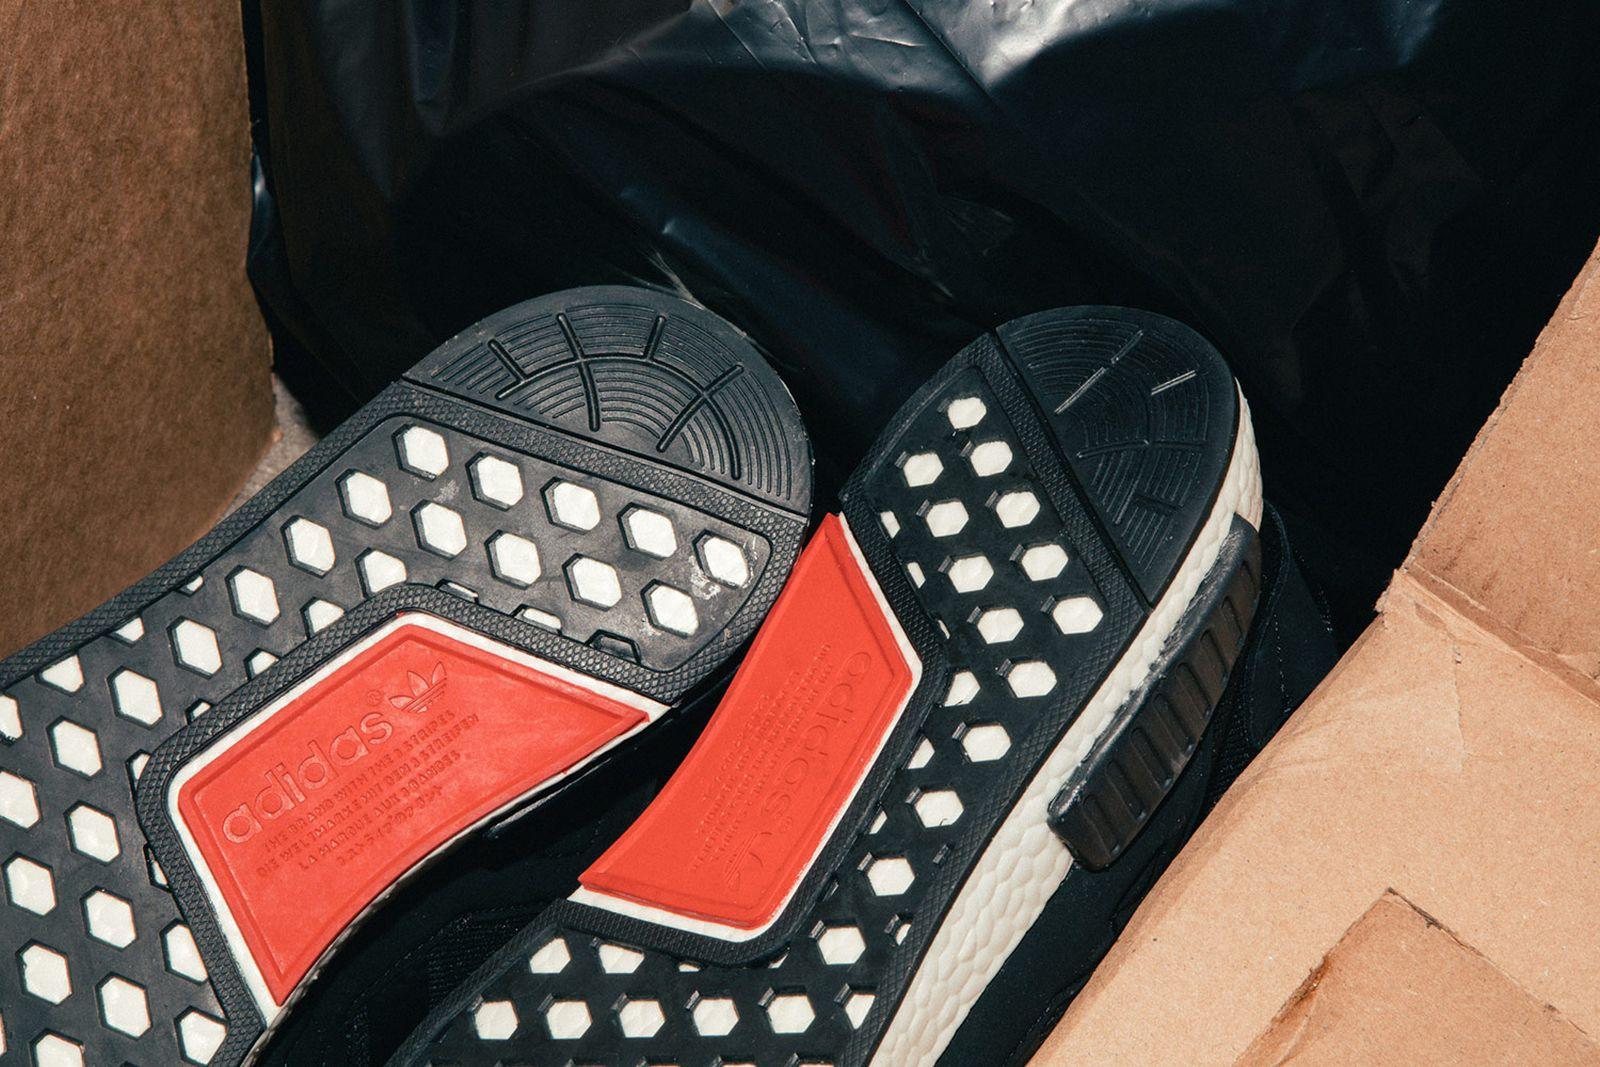 Legit-Check-Fake-Sneakers-Highsnobiety-16